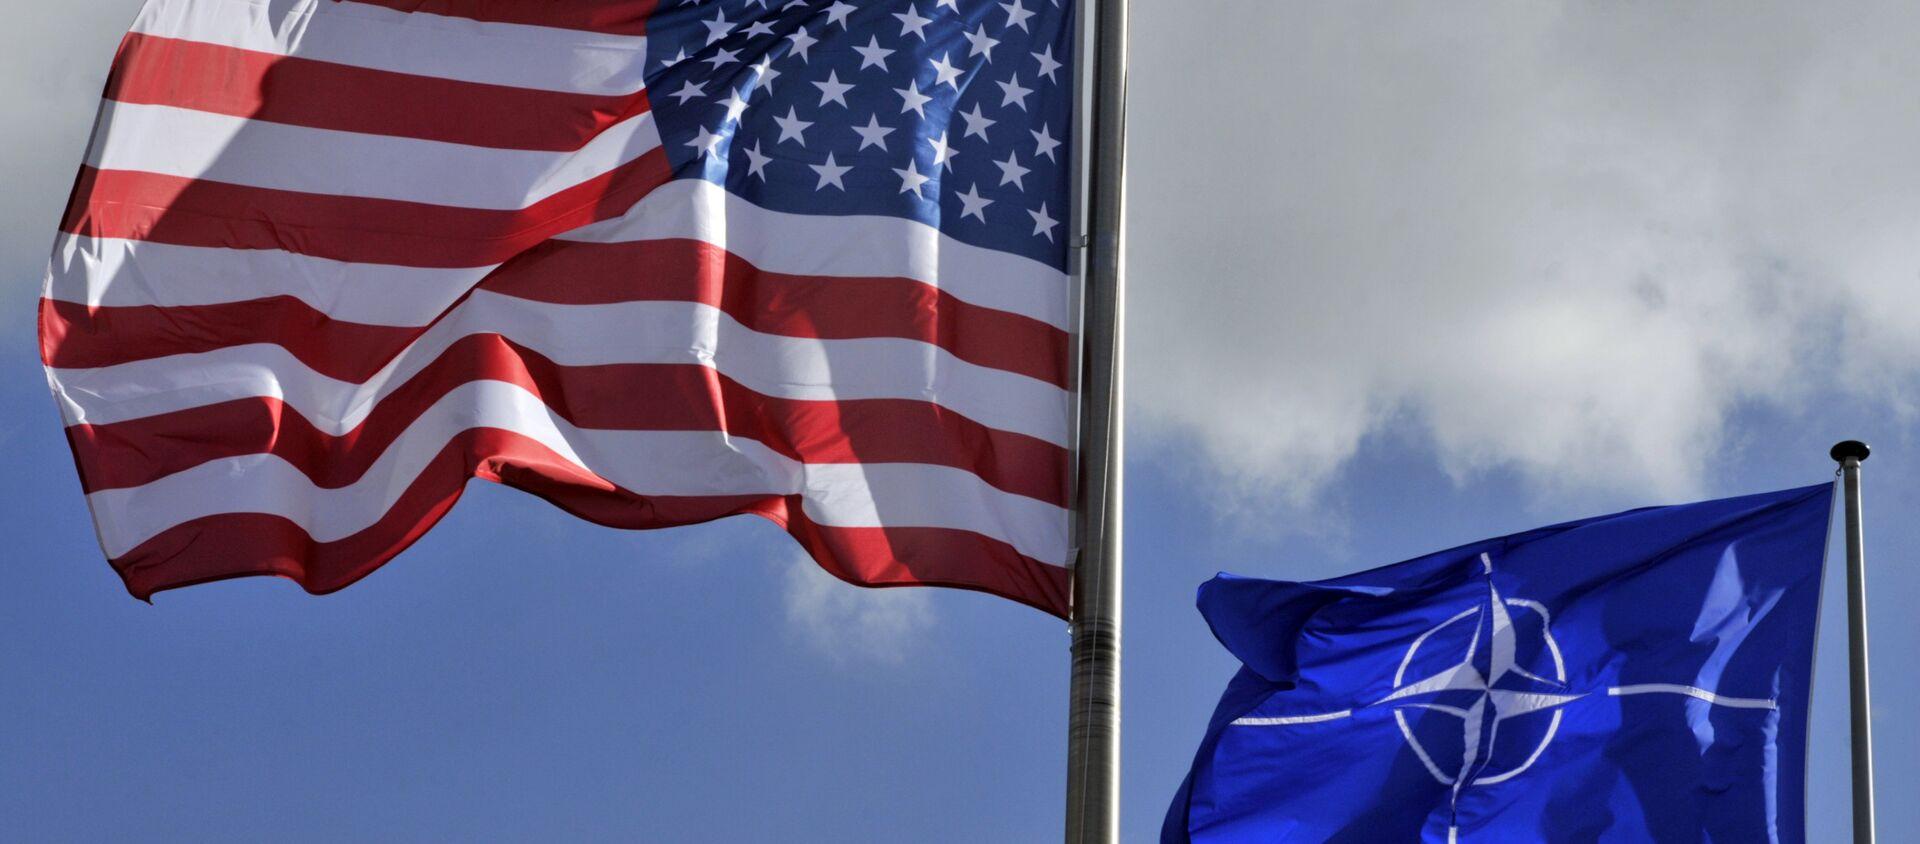 US and NATO flags - Sputnik Mundo, 1920, 26.01.2021